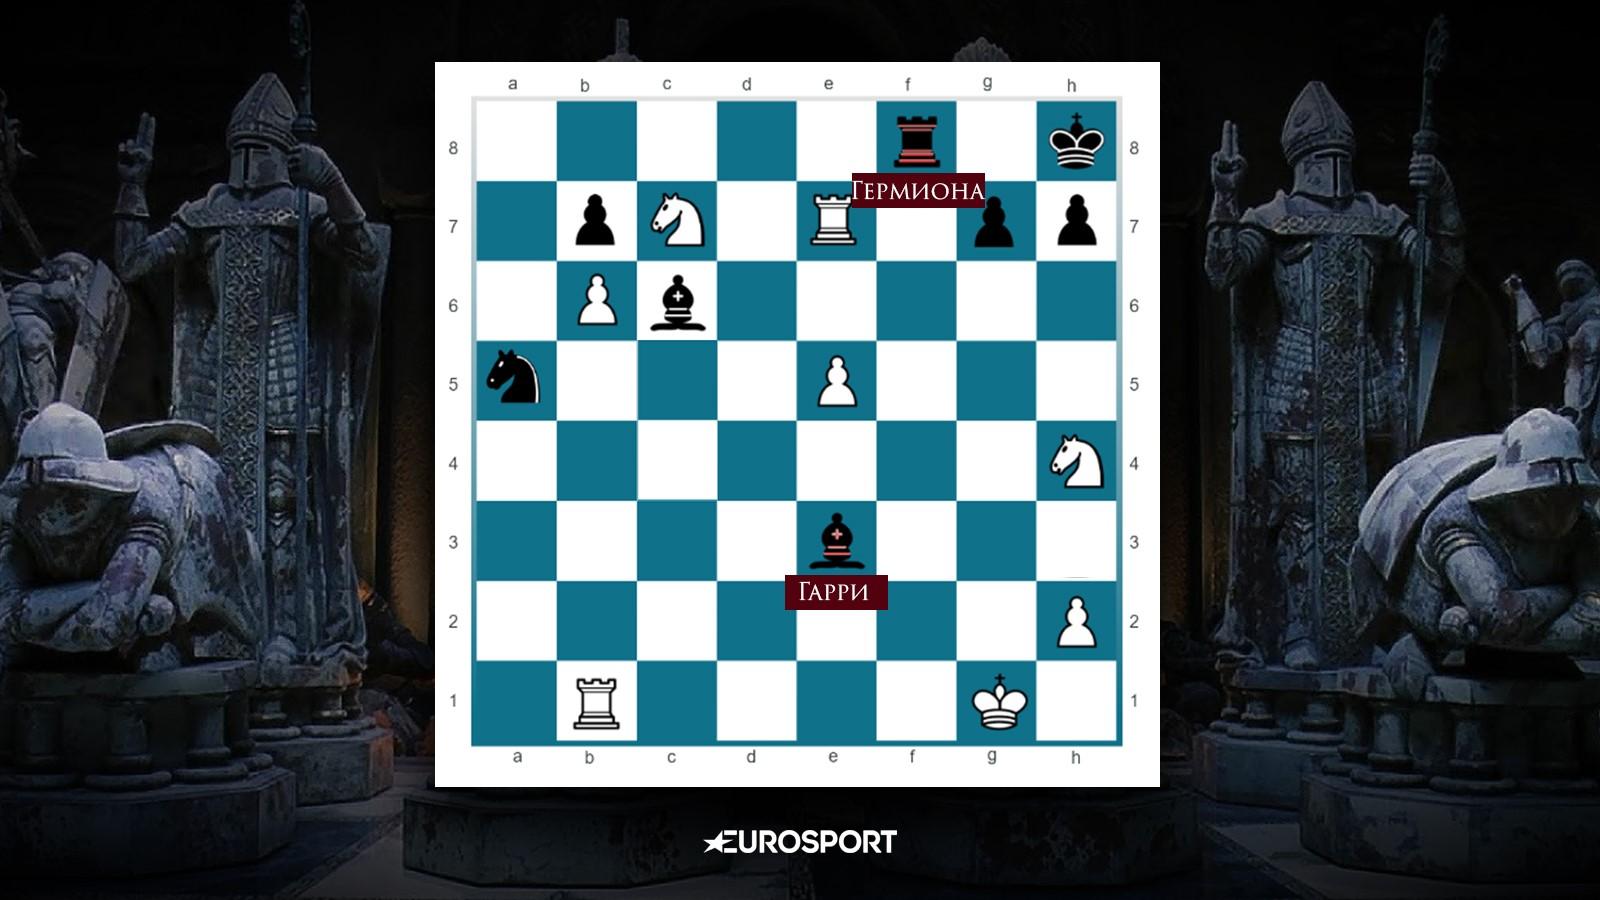 https://i.eurosport.com/2021/01/08/2967130.jpg